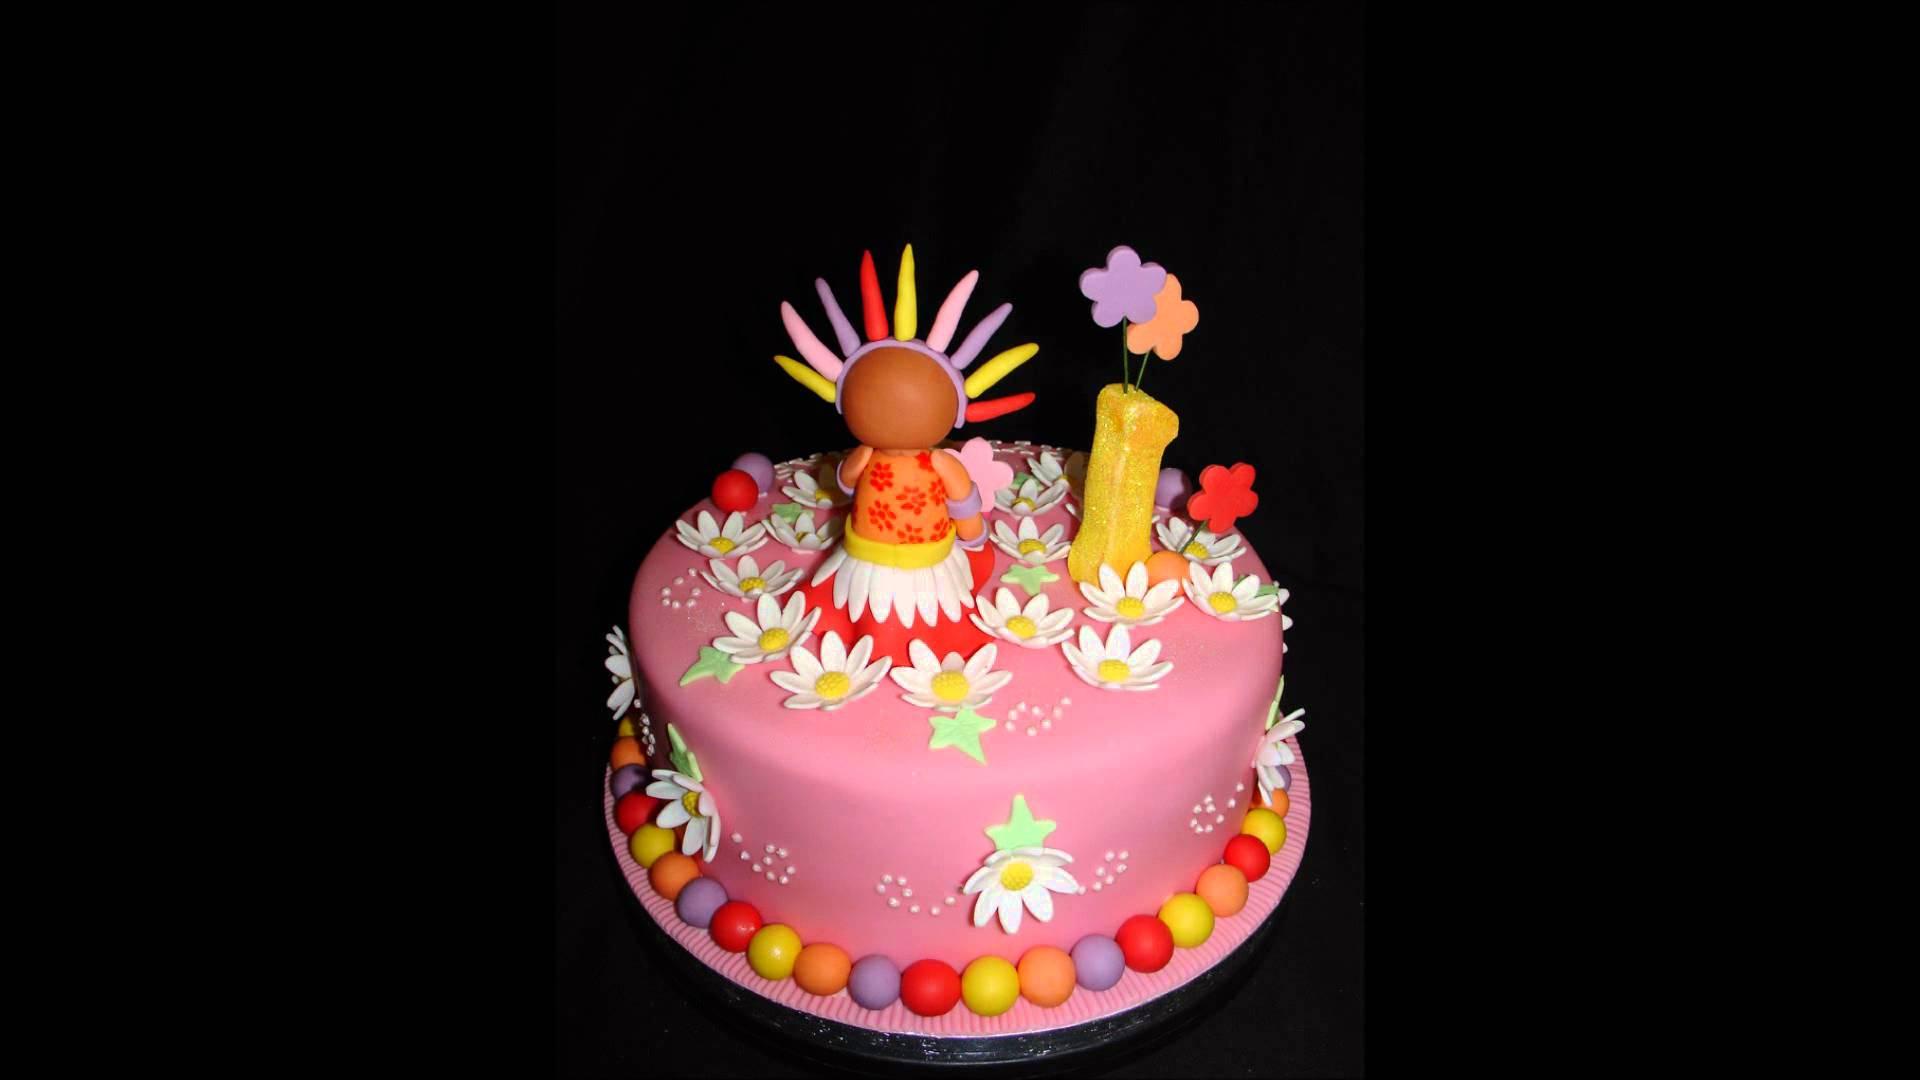 online cake order in delhi ncr